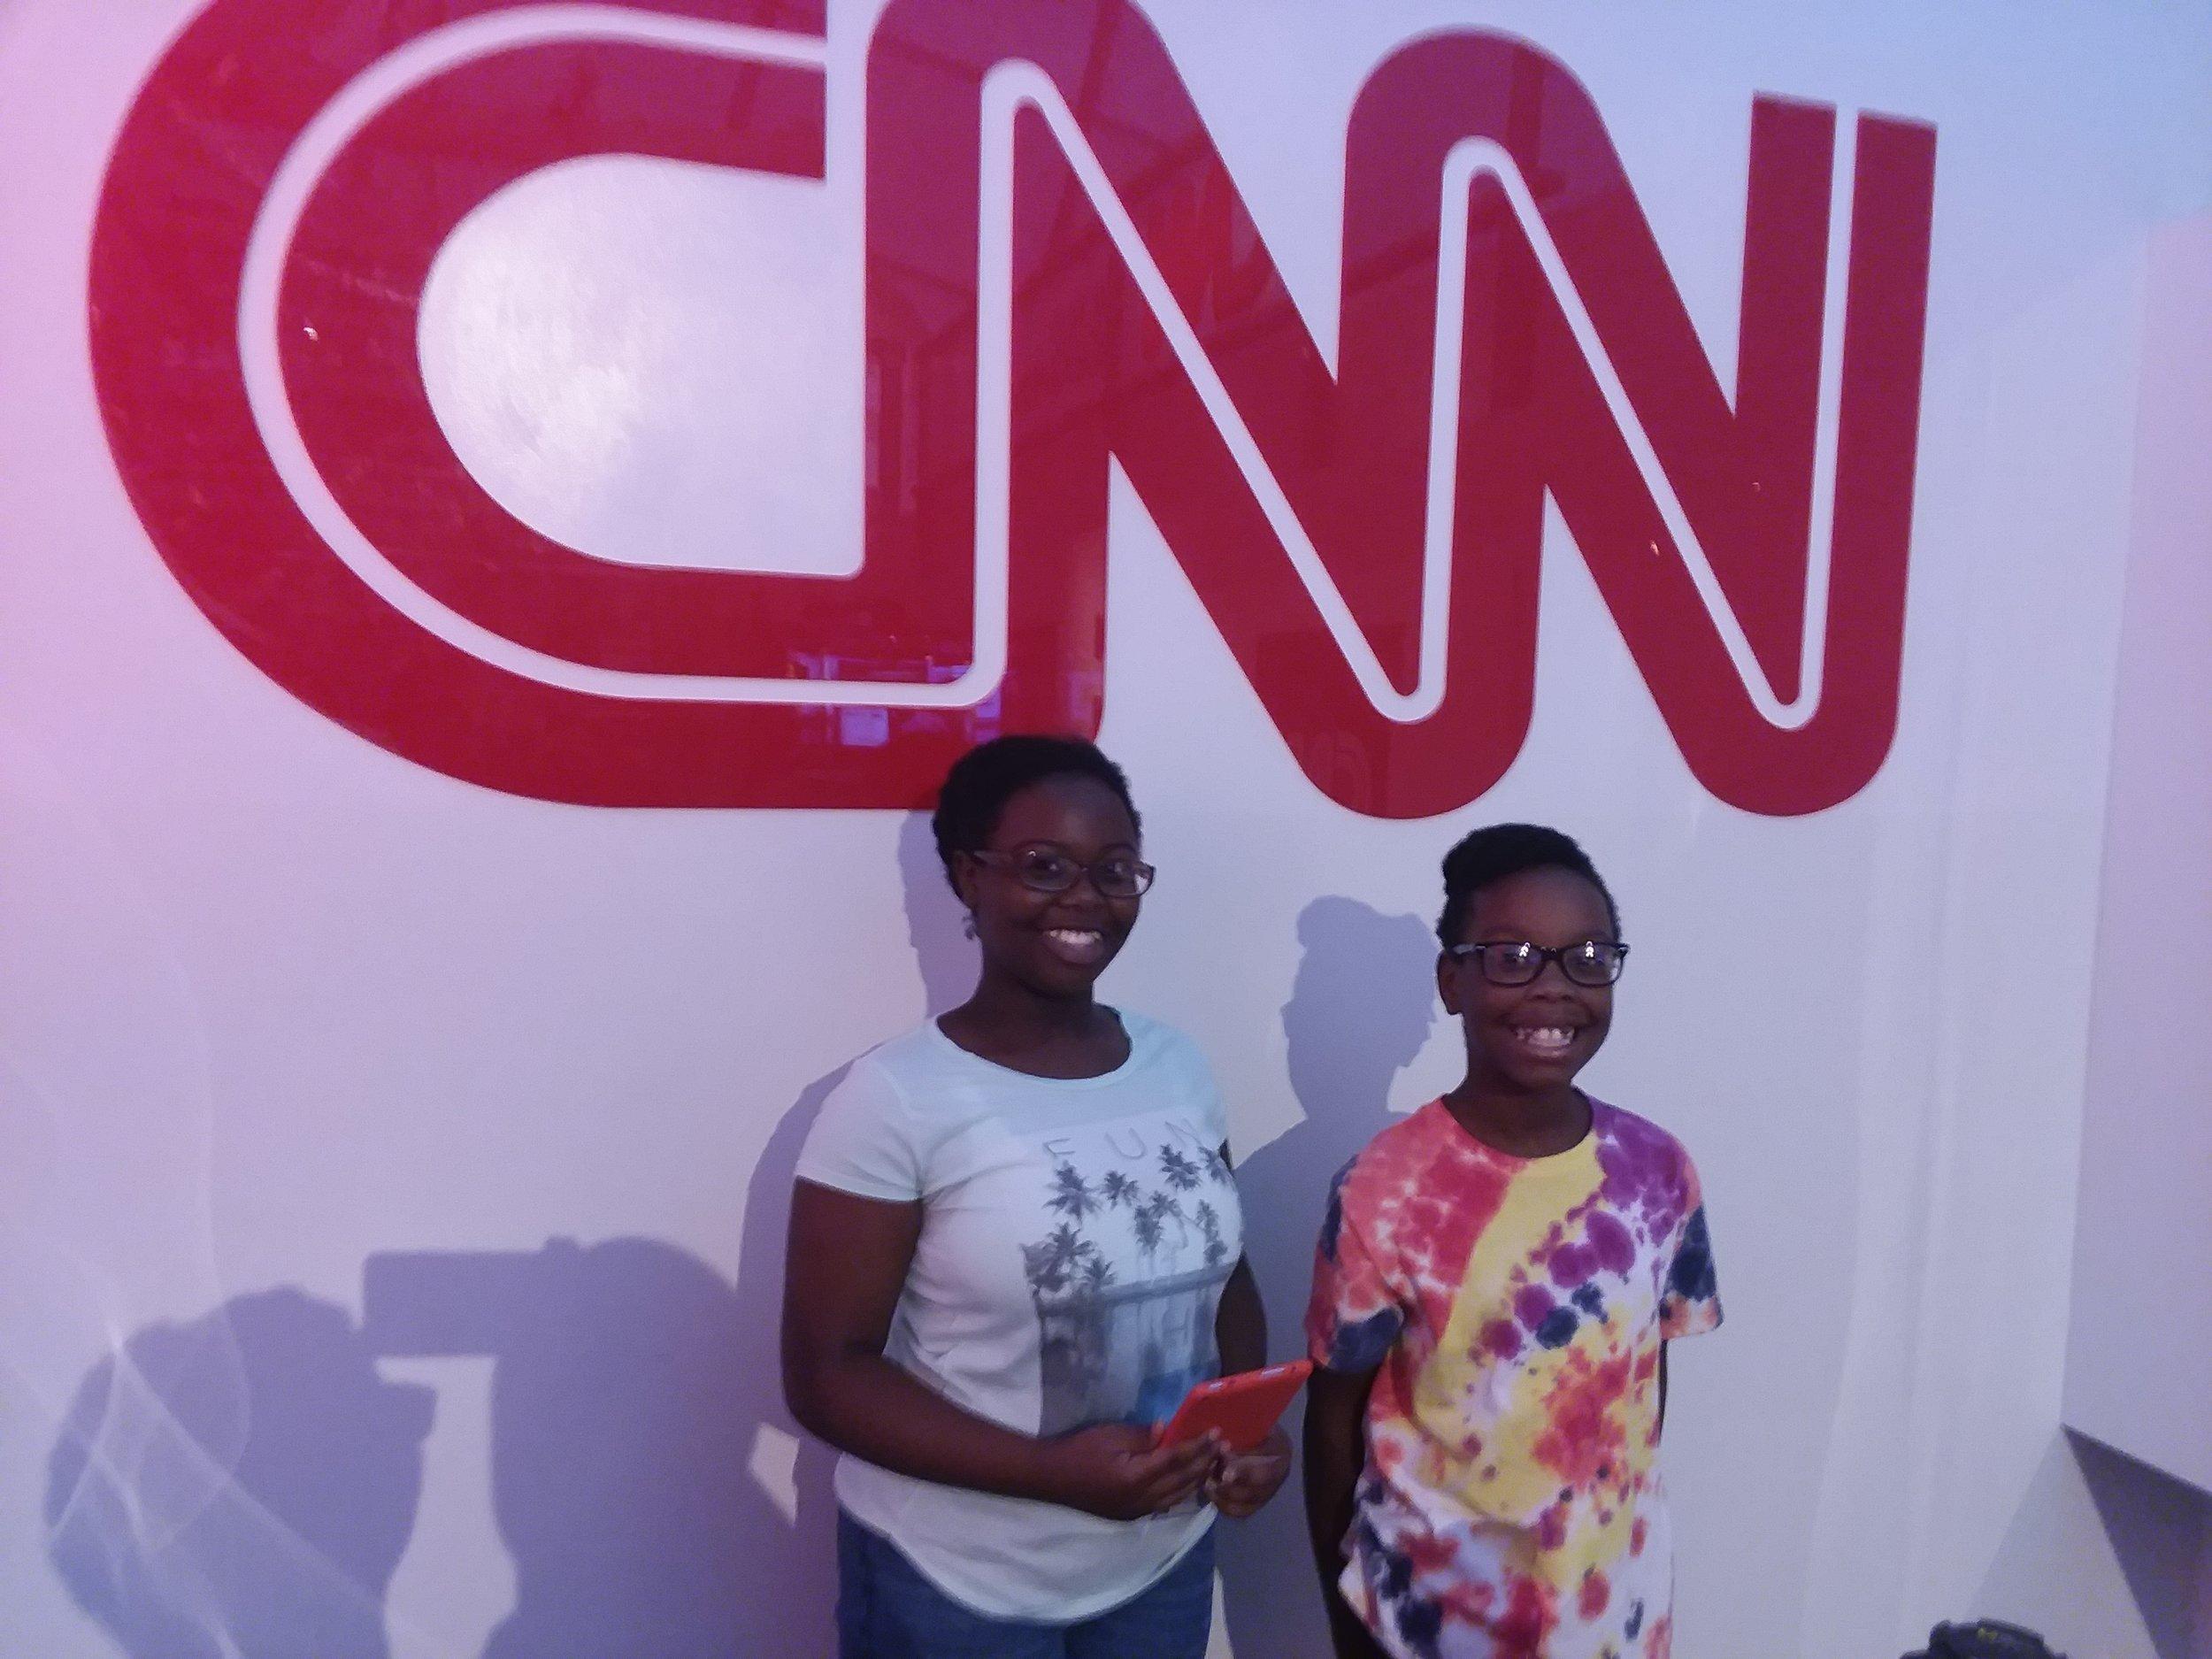 We toured CNN.